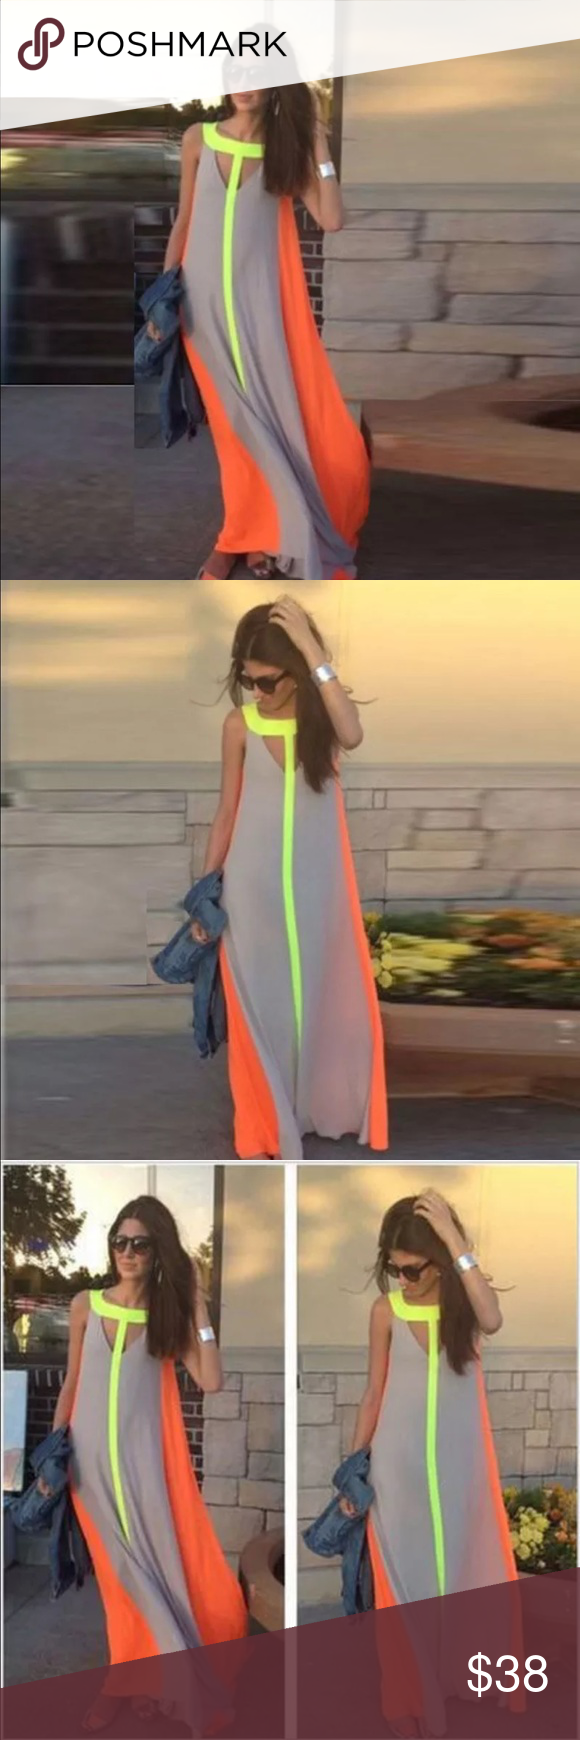 Brank new colorful long maxi dress nwt dresses dresses maxi